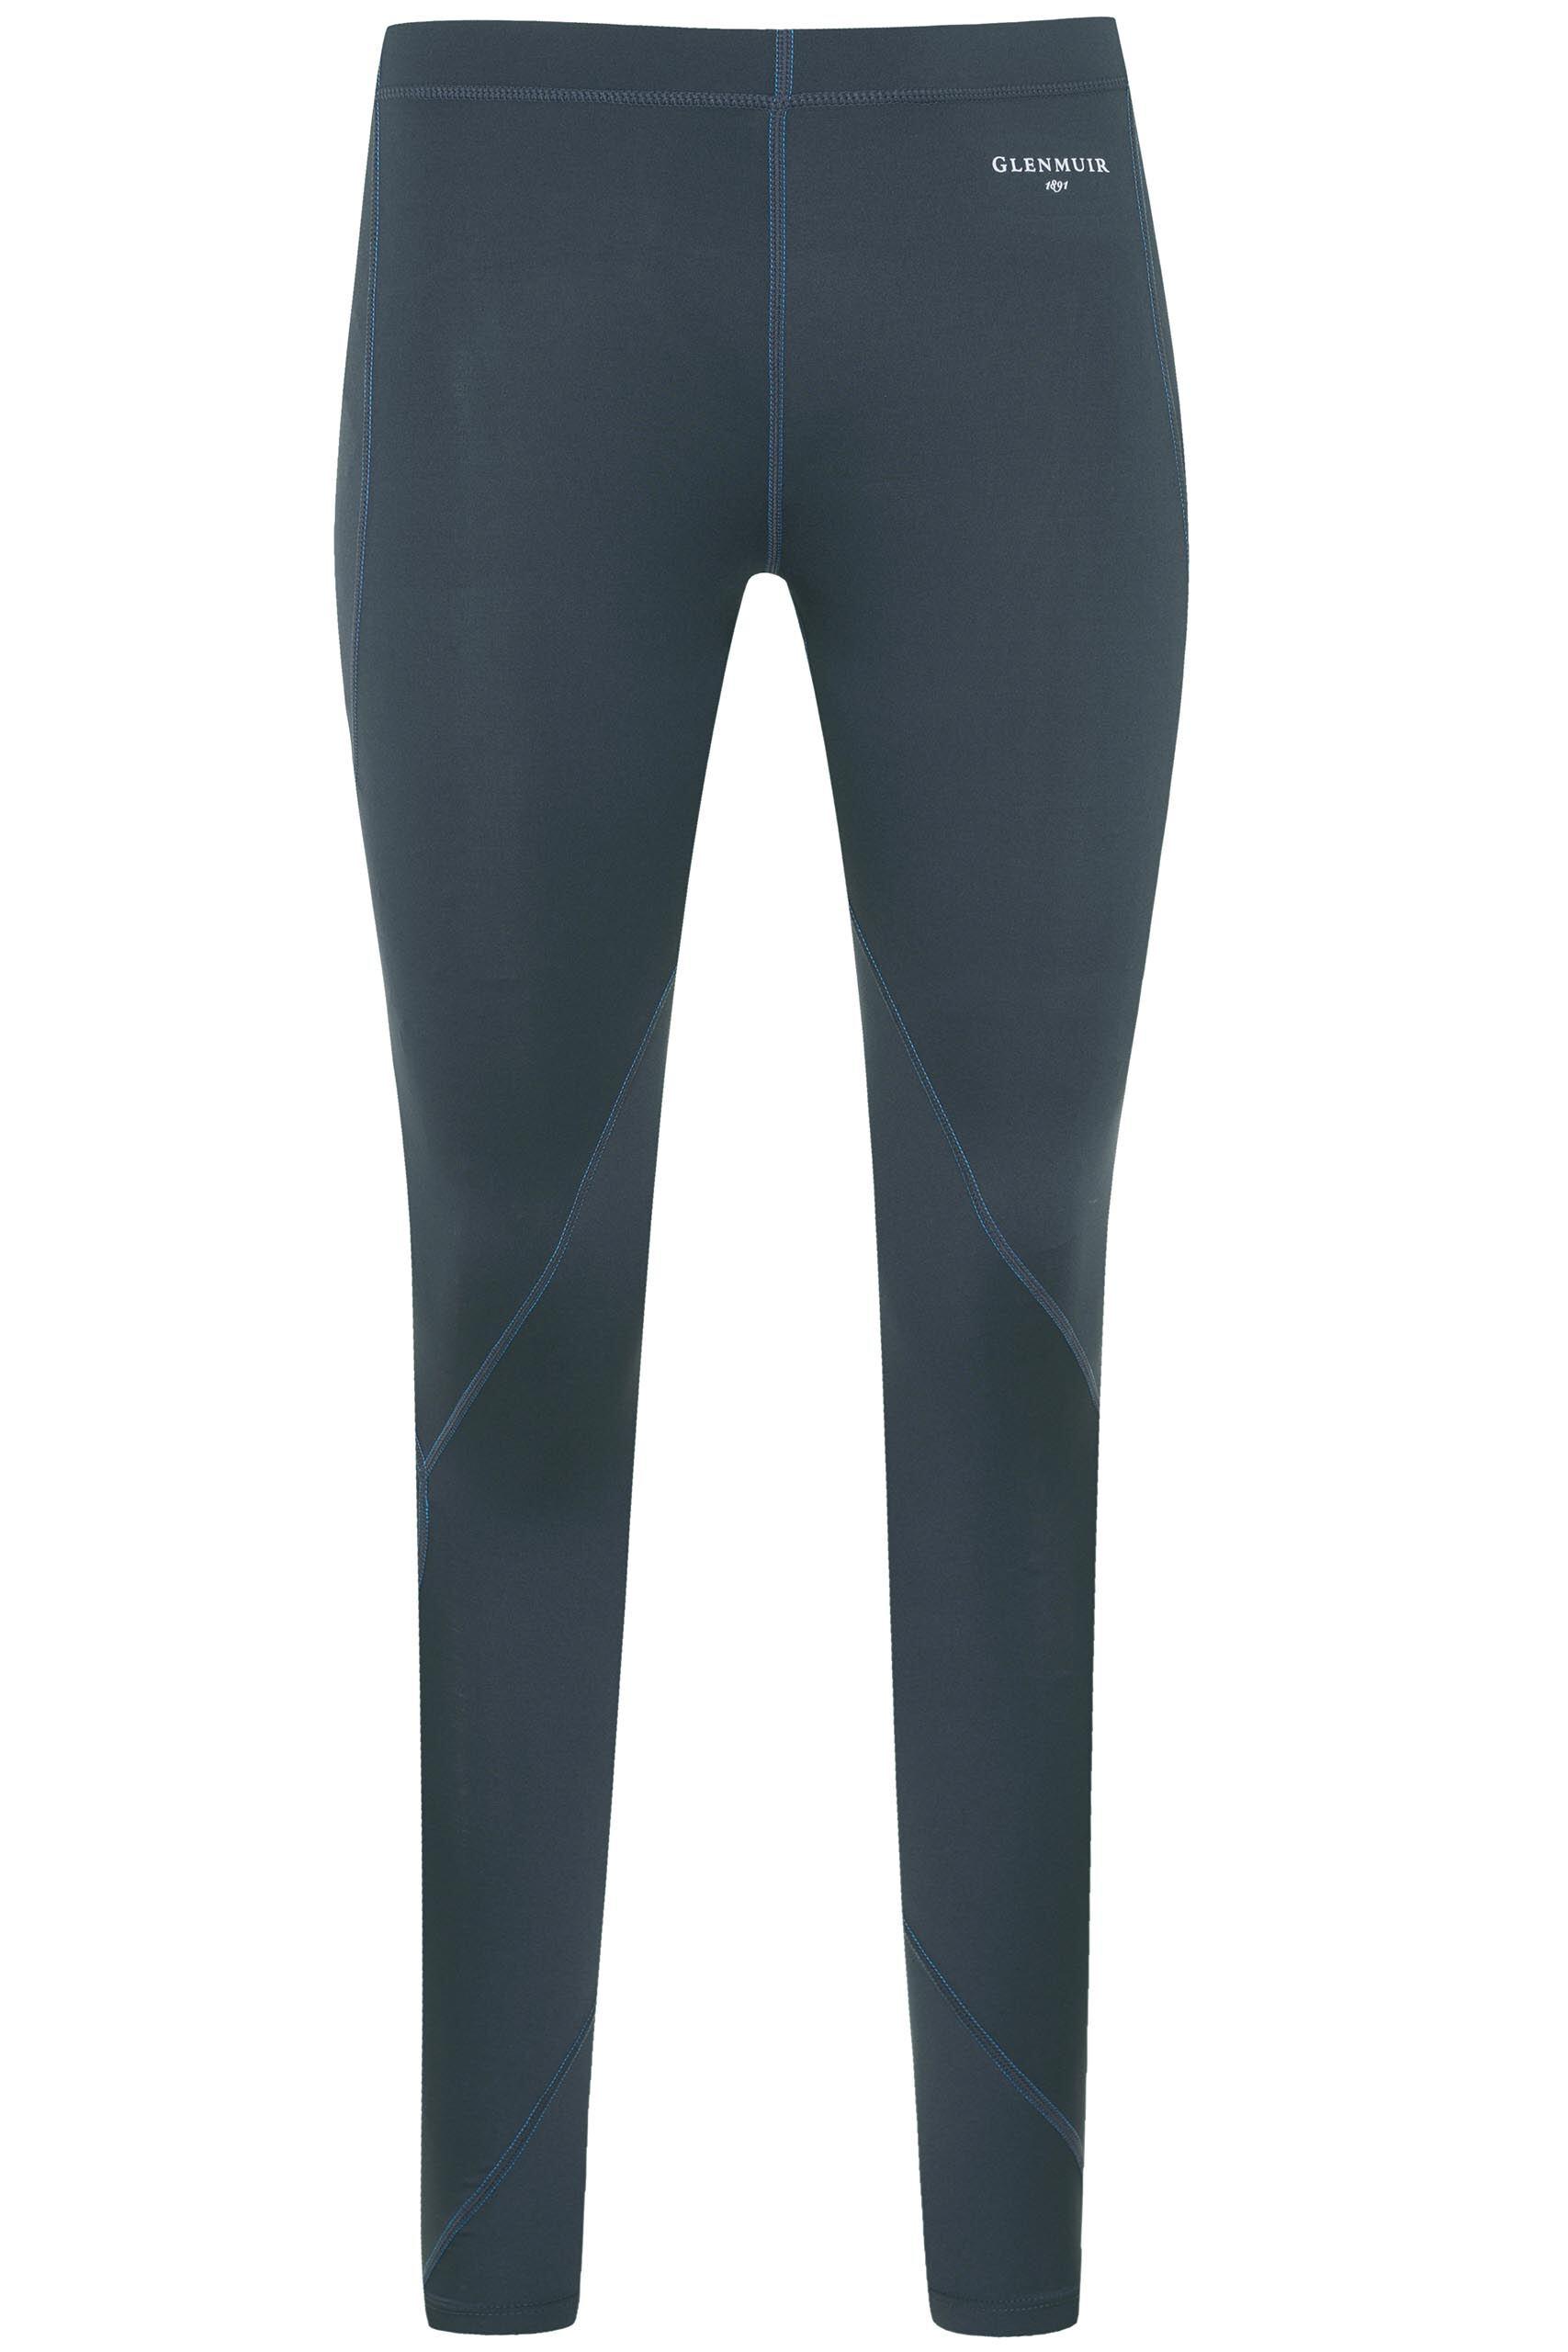 Image of 1 Pack Grey Compression Base Layer Leggings Ladies 14-16 Ladies - Glenmuir